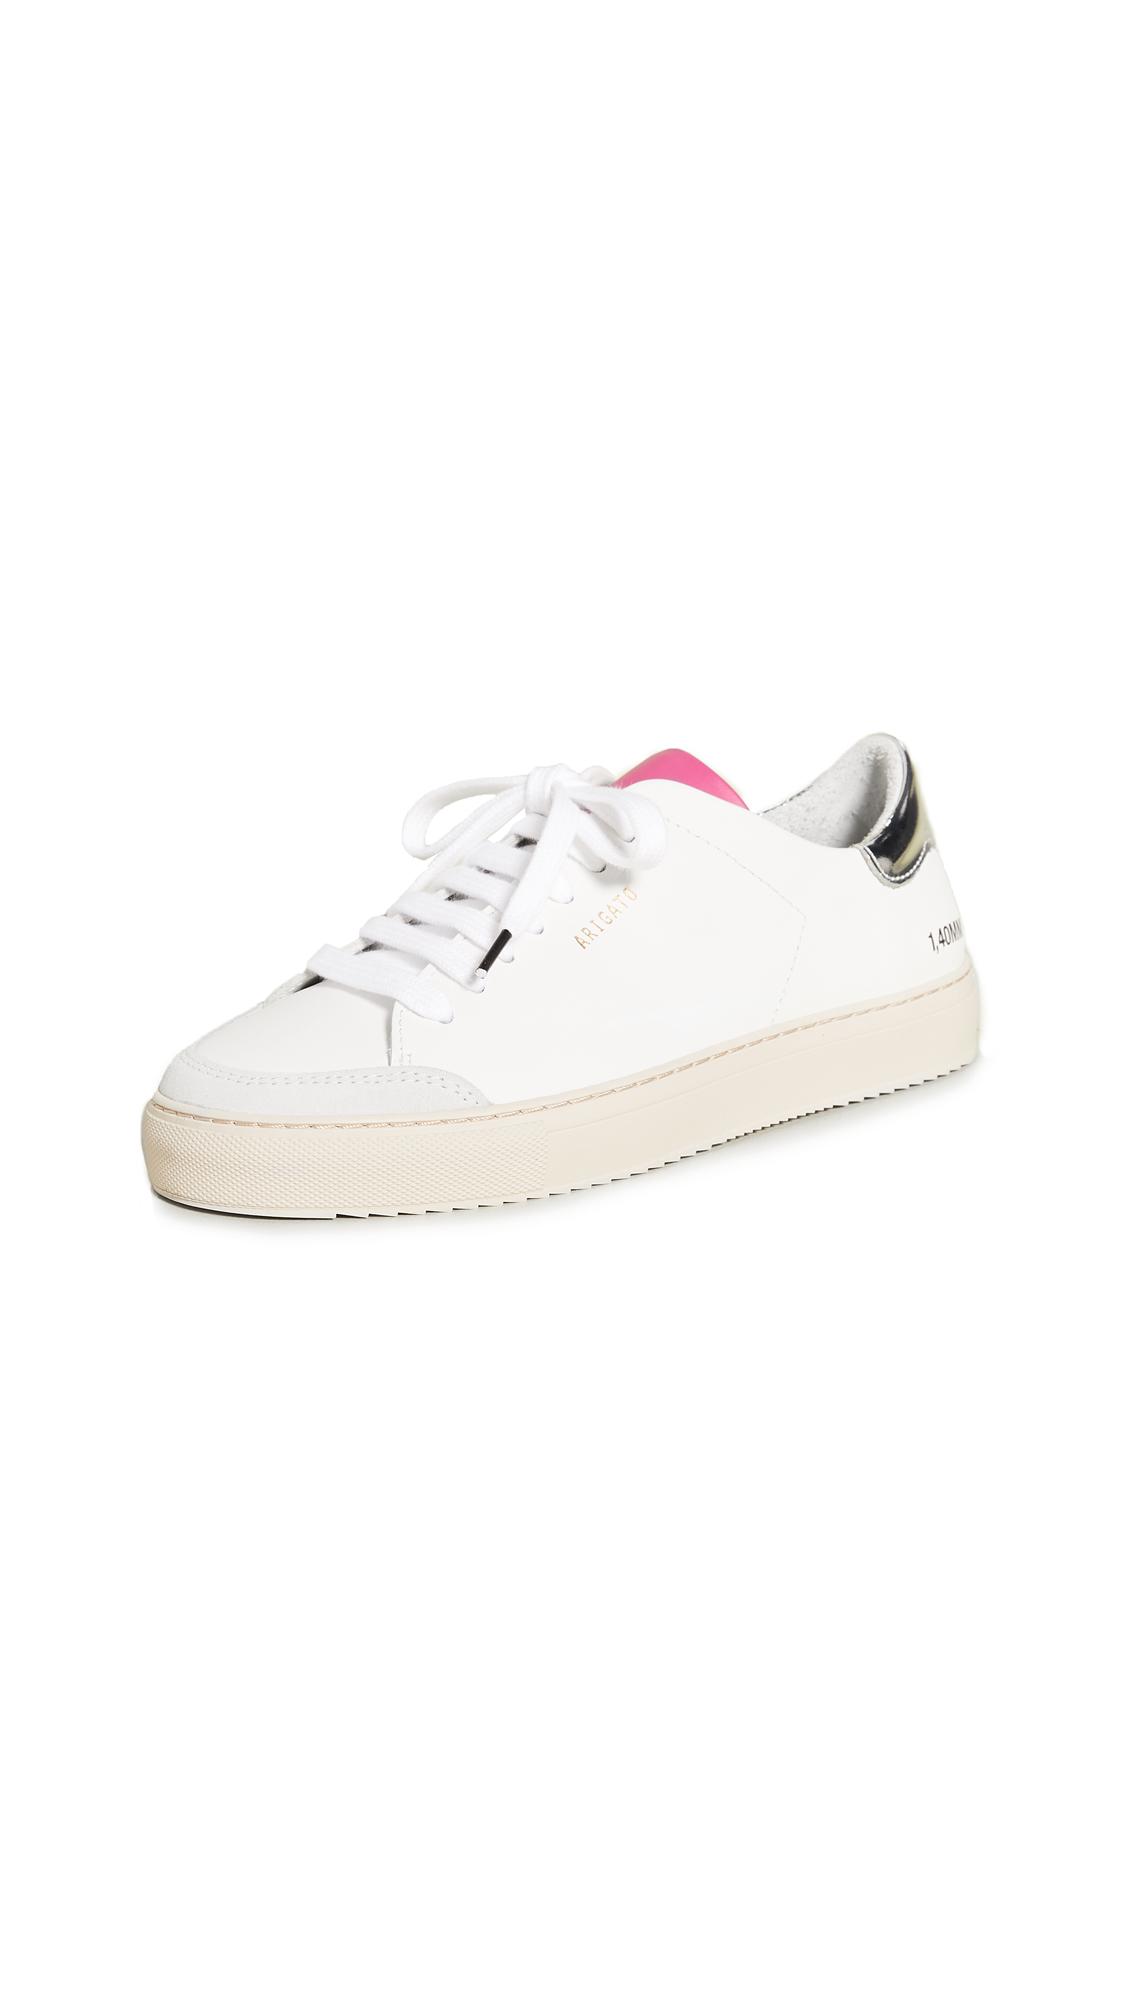 Axel Arigato Clean 90 Sneakers - Silver/Fuchsia/Black